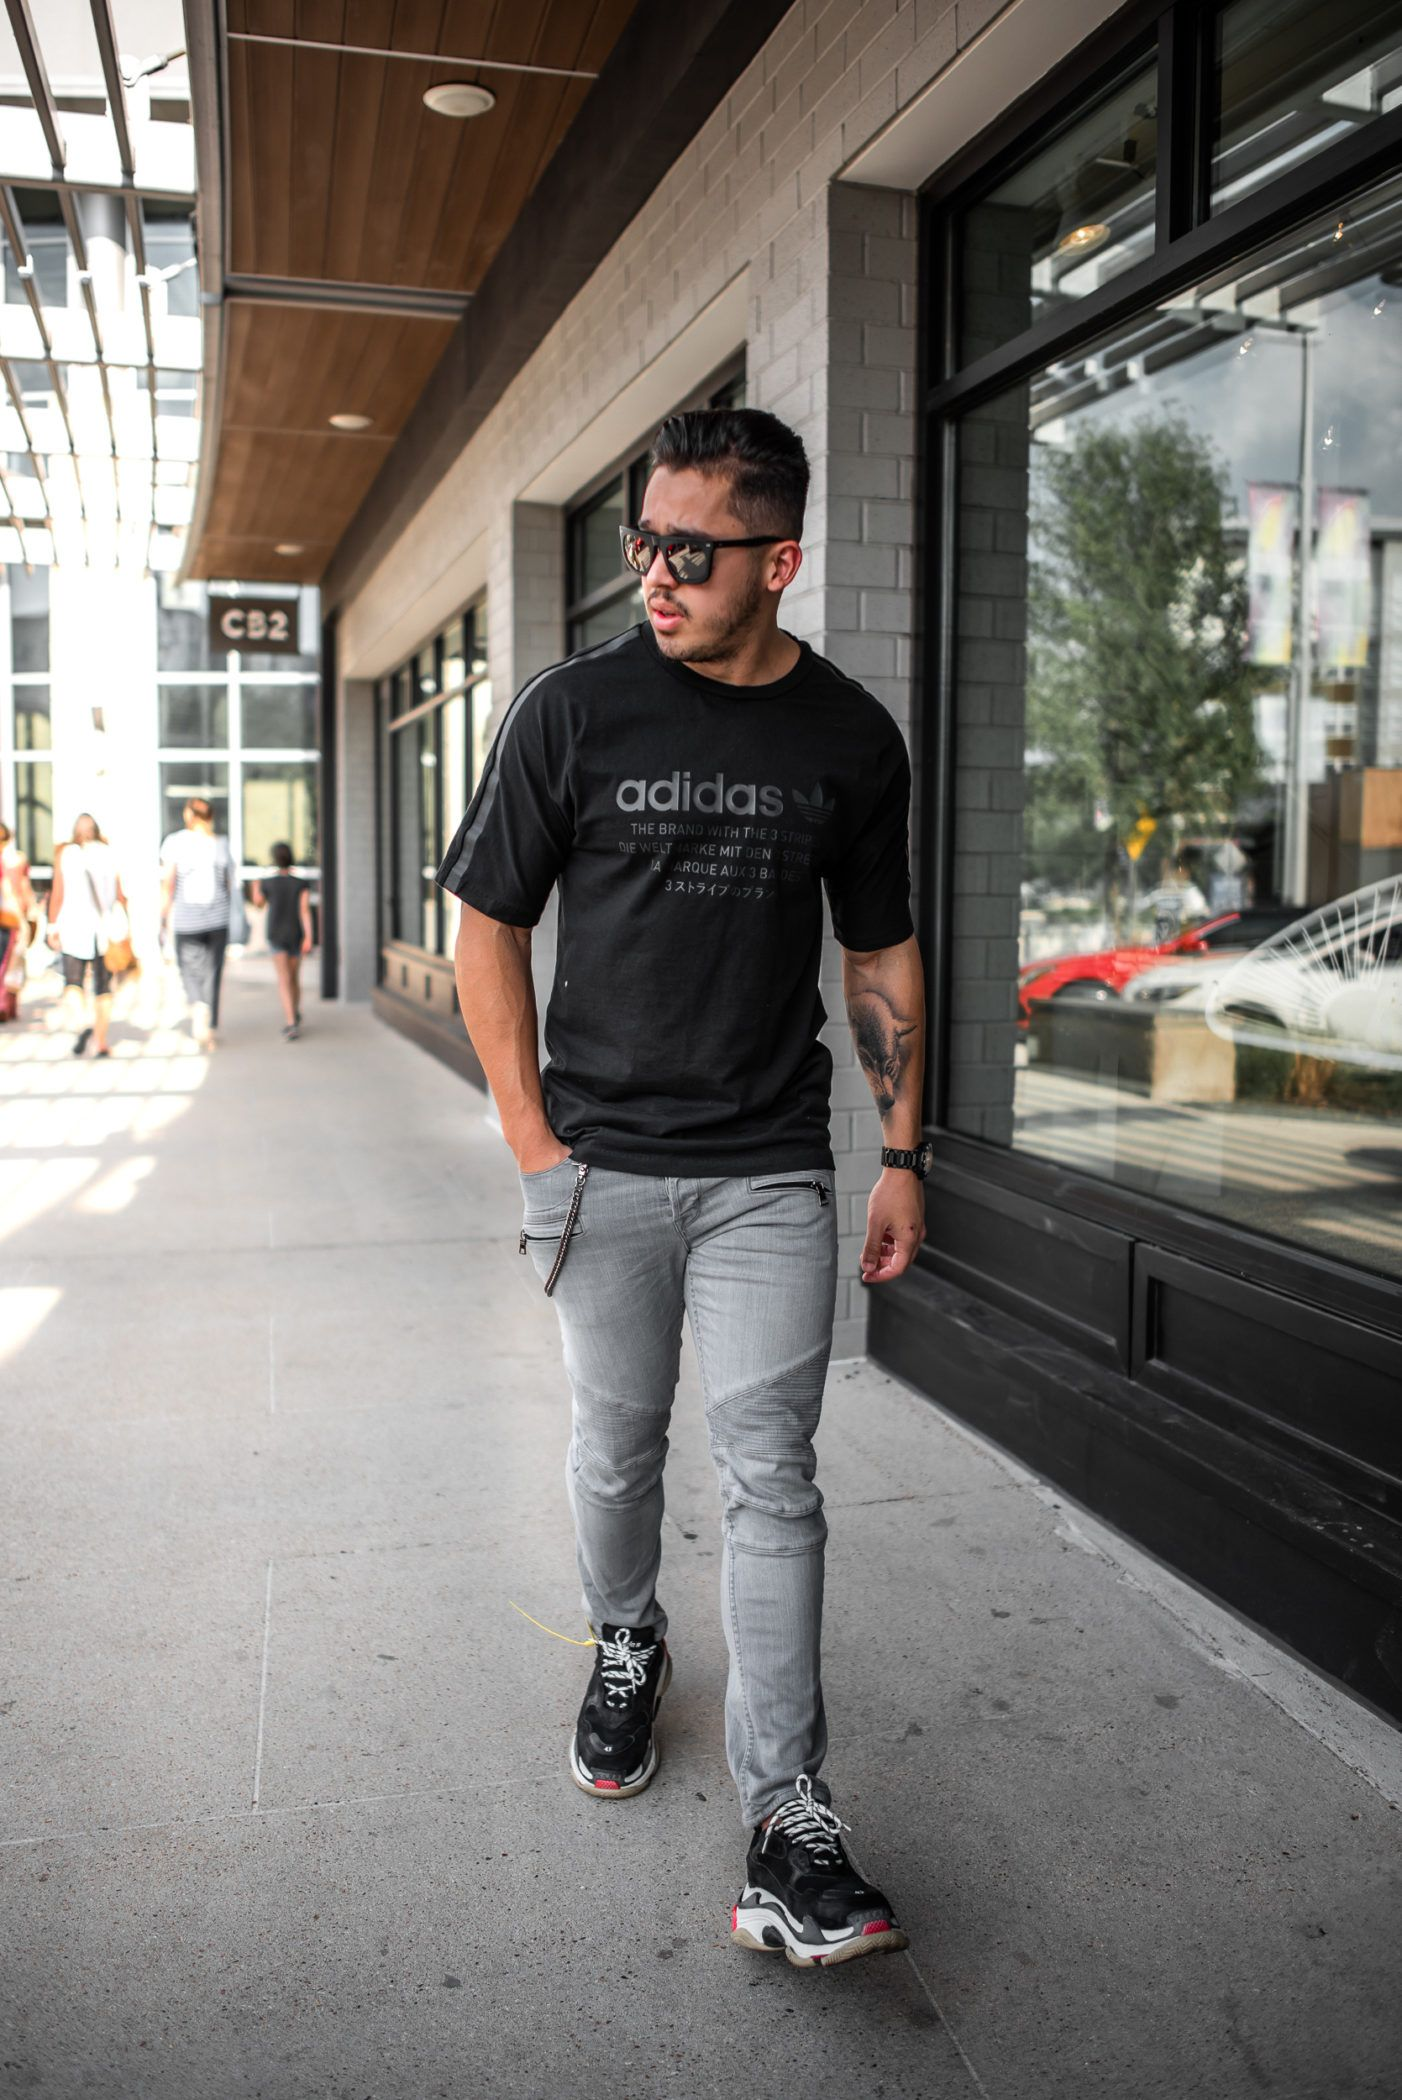 Adidas street style, Best mens fashion